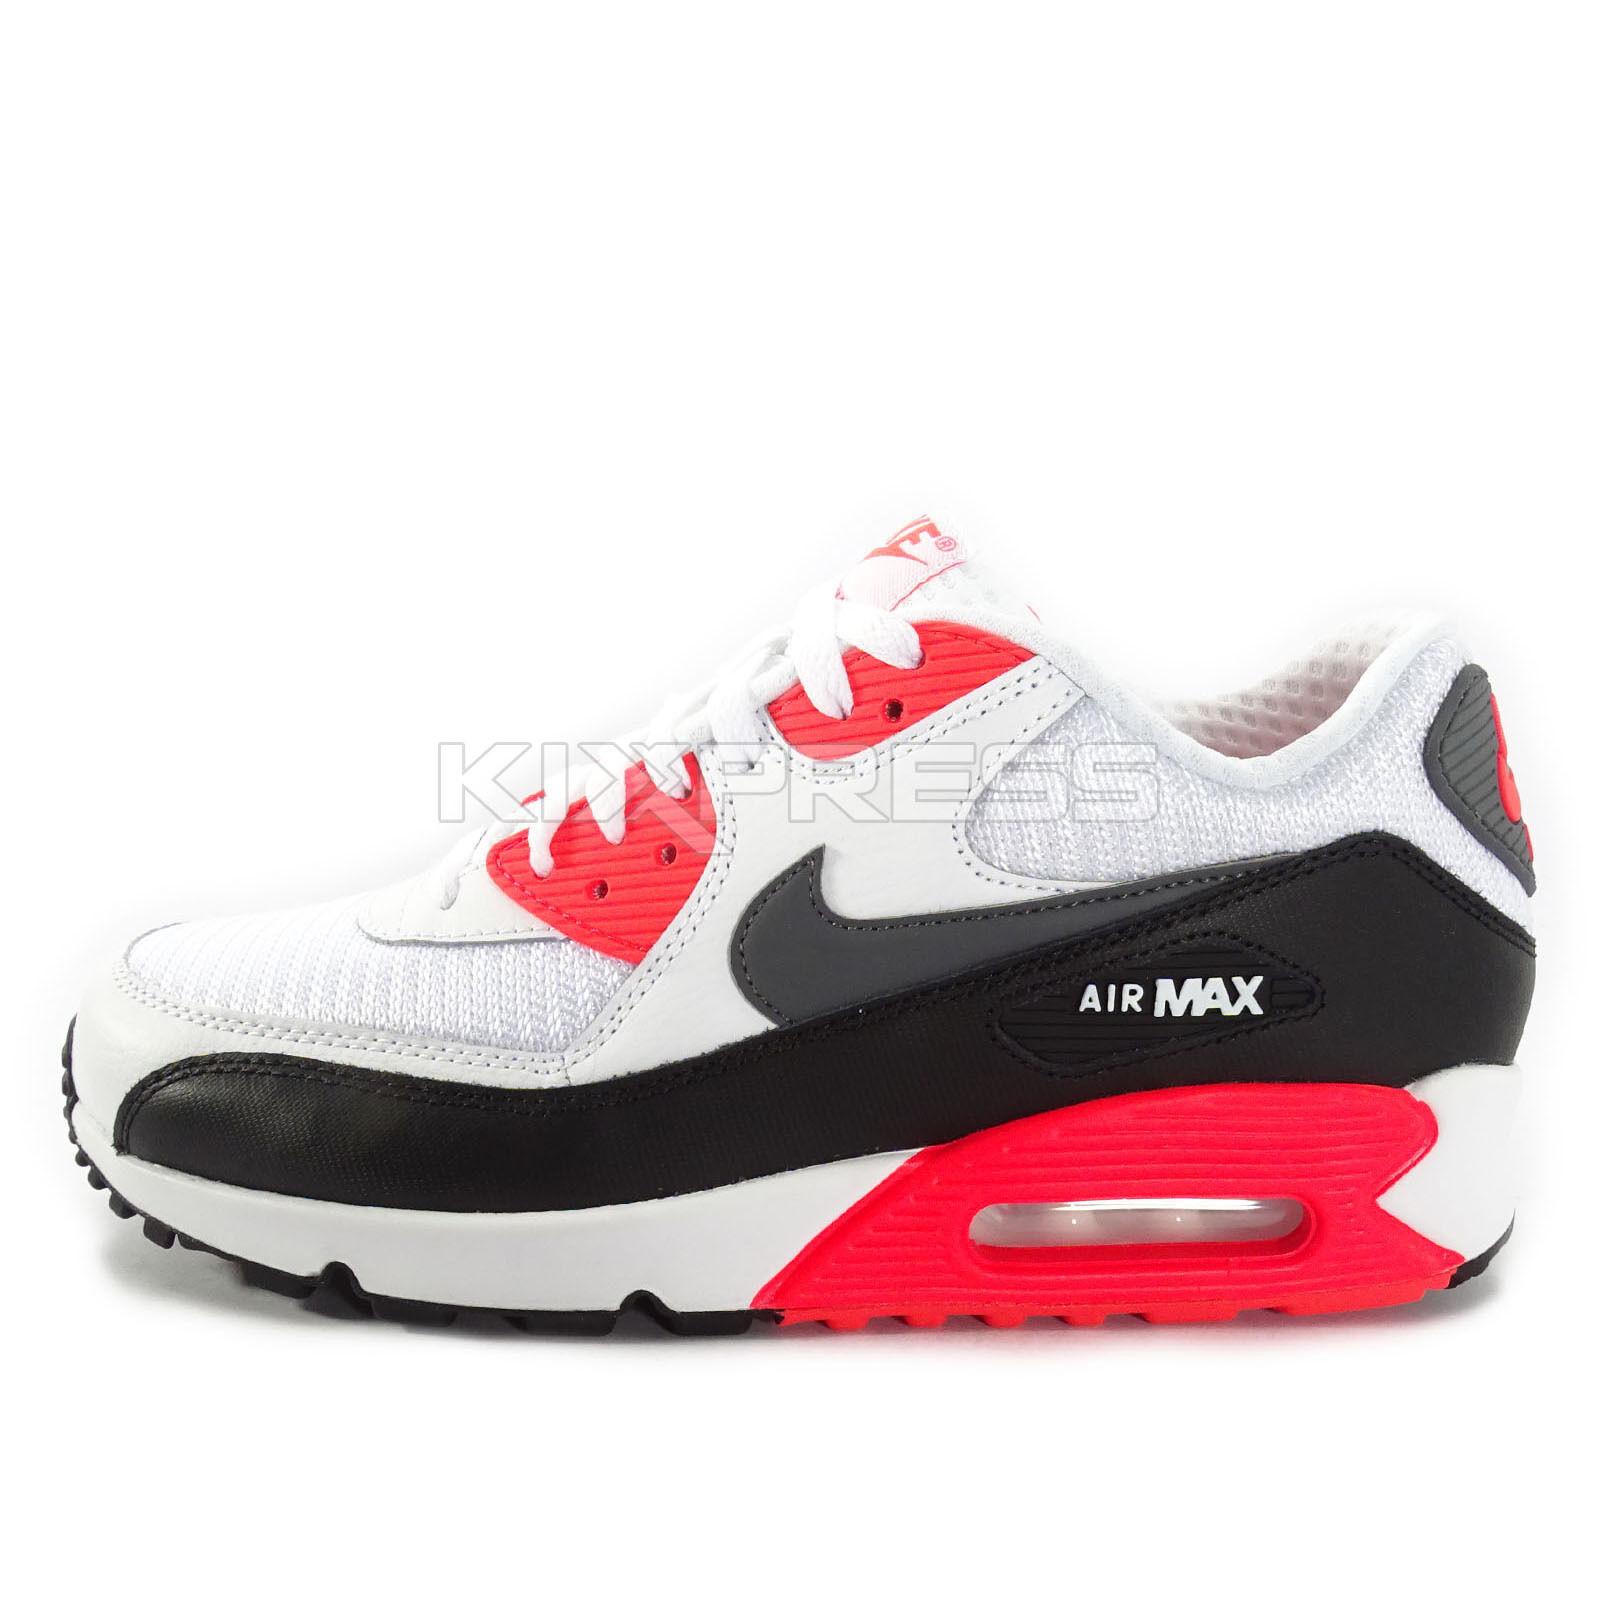 Nike Air Max 90 OG Essential [537384-126] NSW Running OG 90 White/Grey-Black-Infrared 94a778